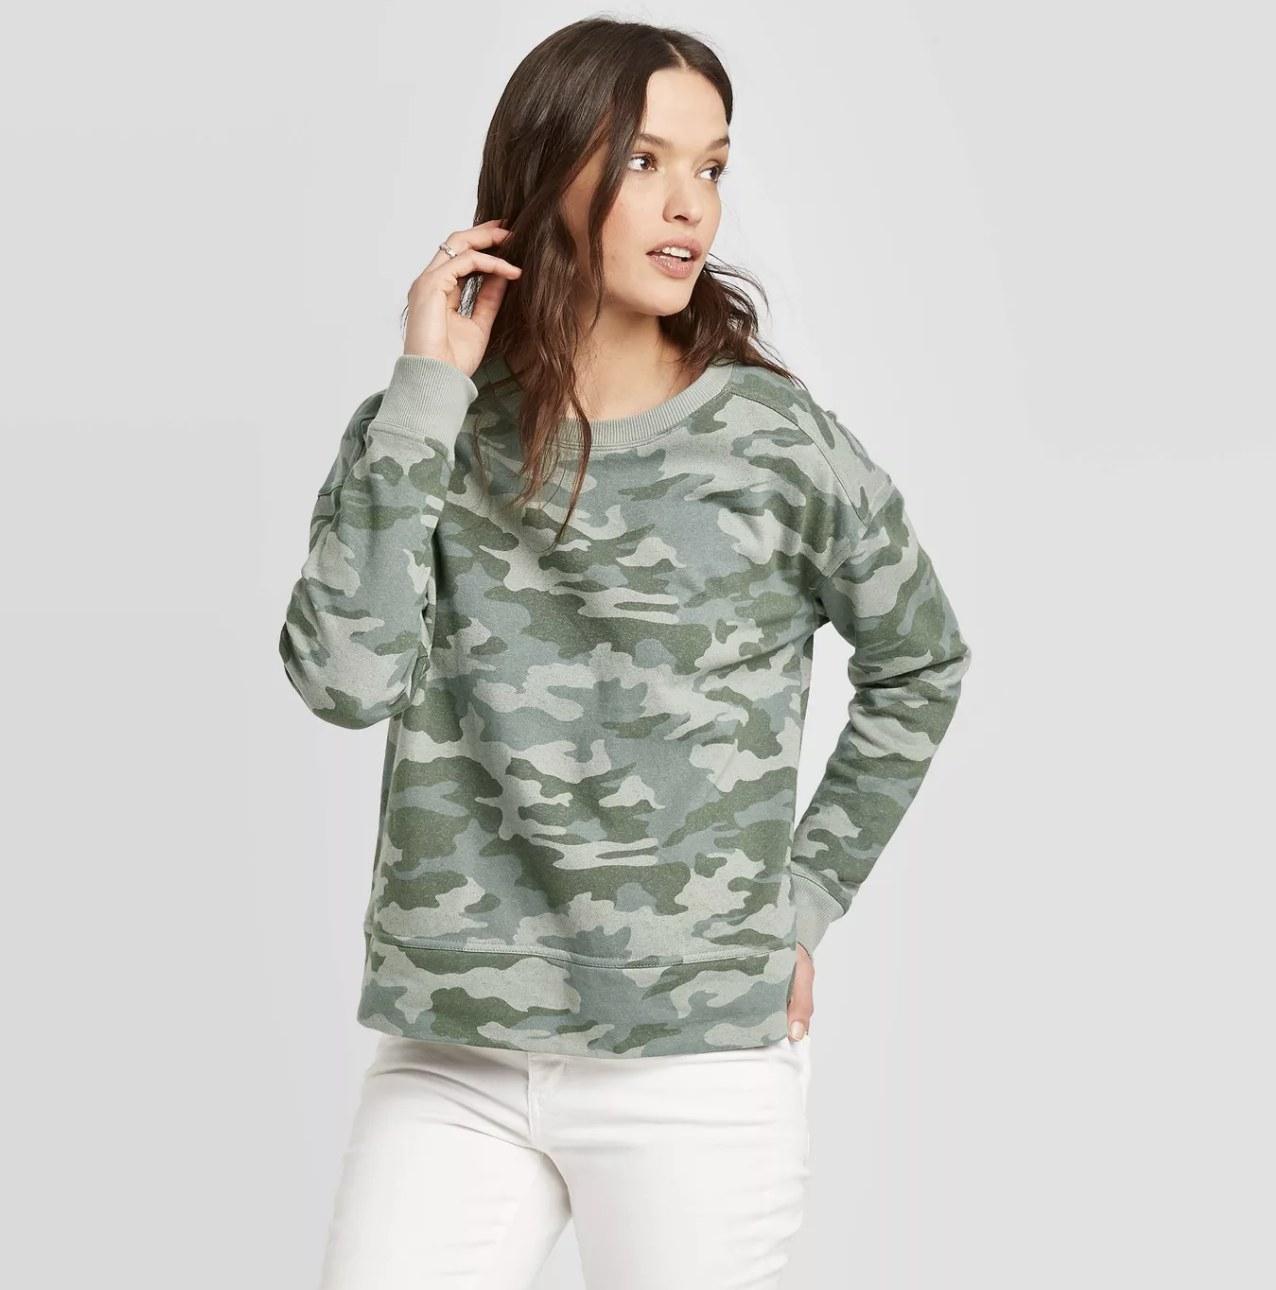 Model wearing the camo print sweatshirt